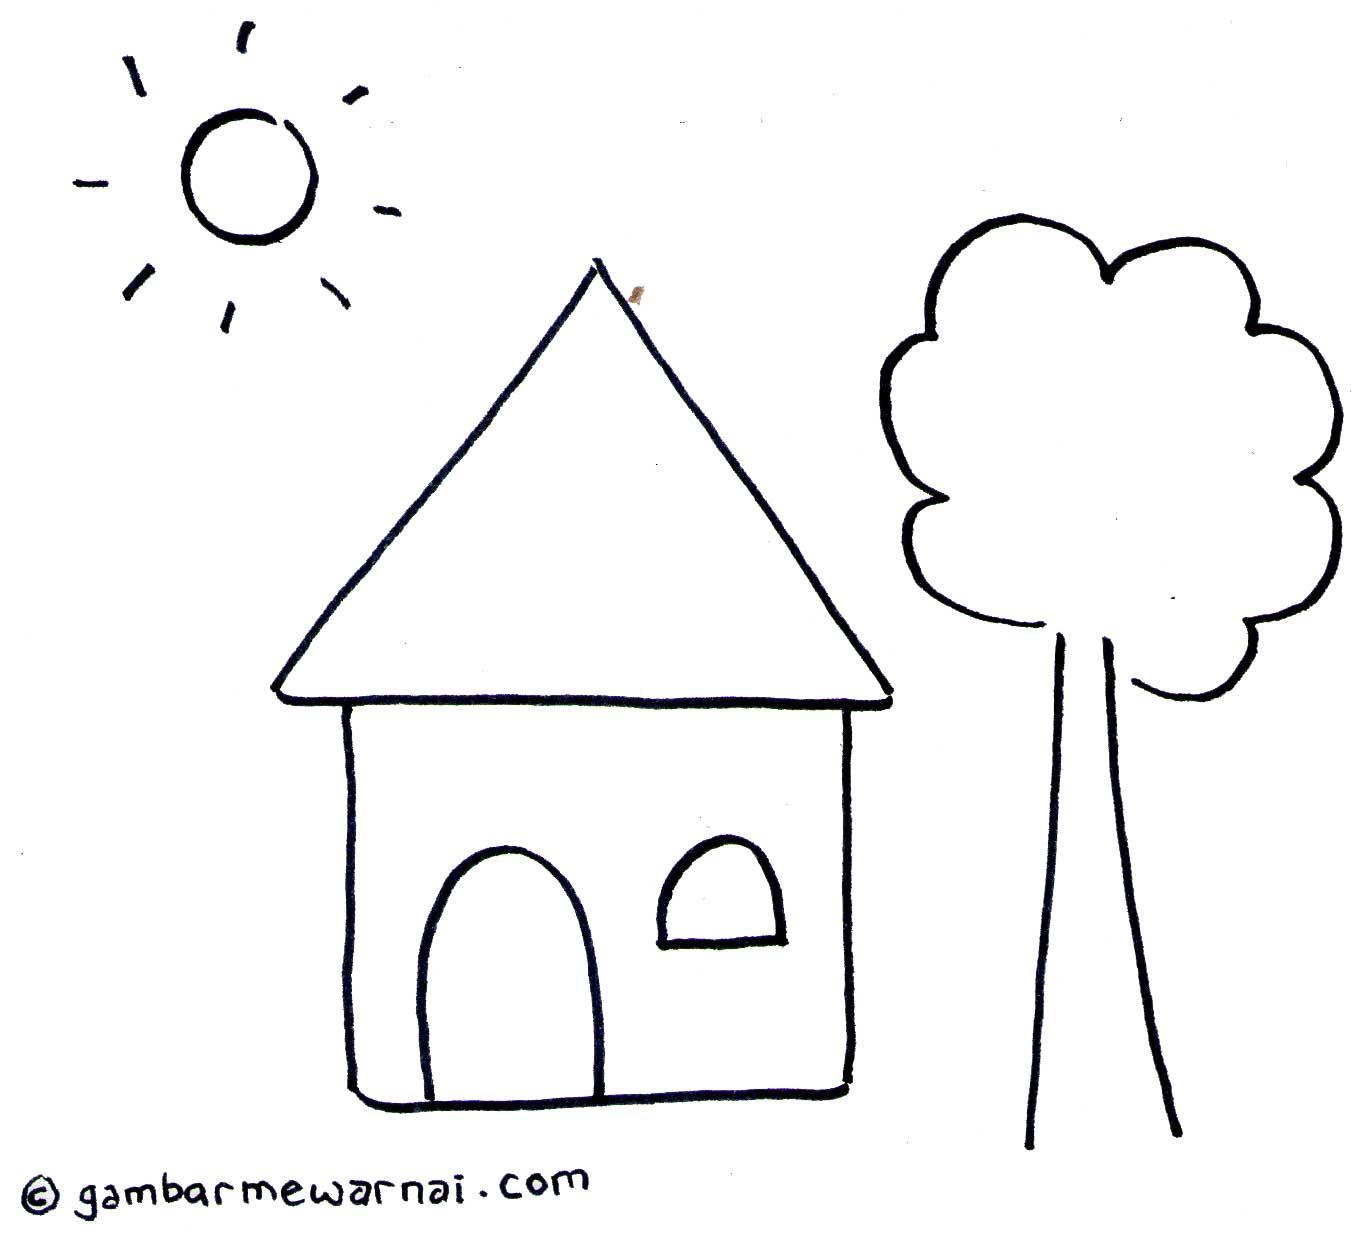 Gambar Mewarnai Rumah  gambar mewarnai